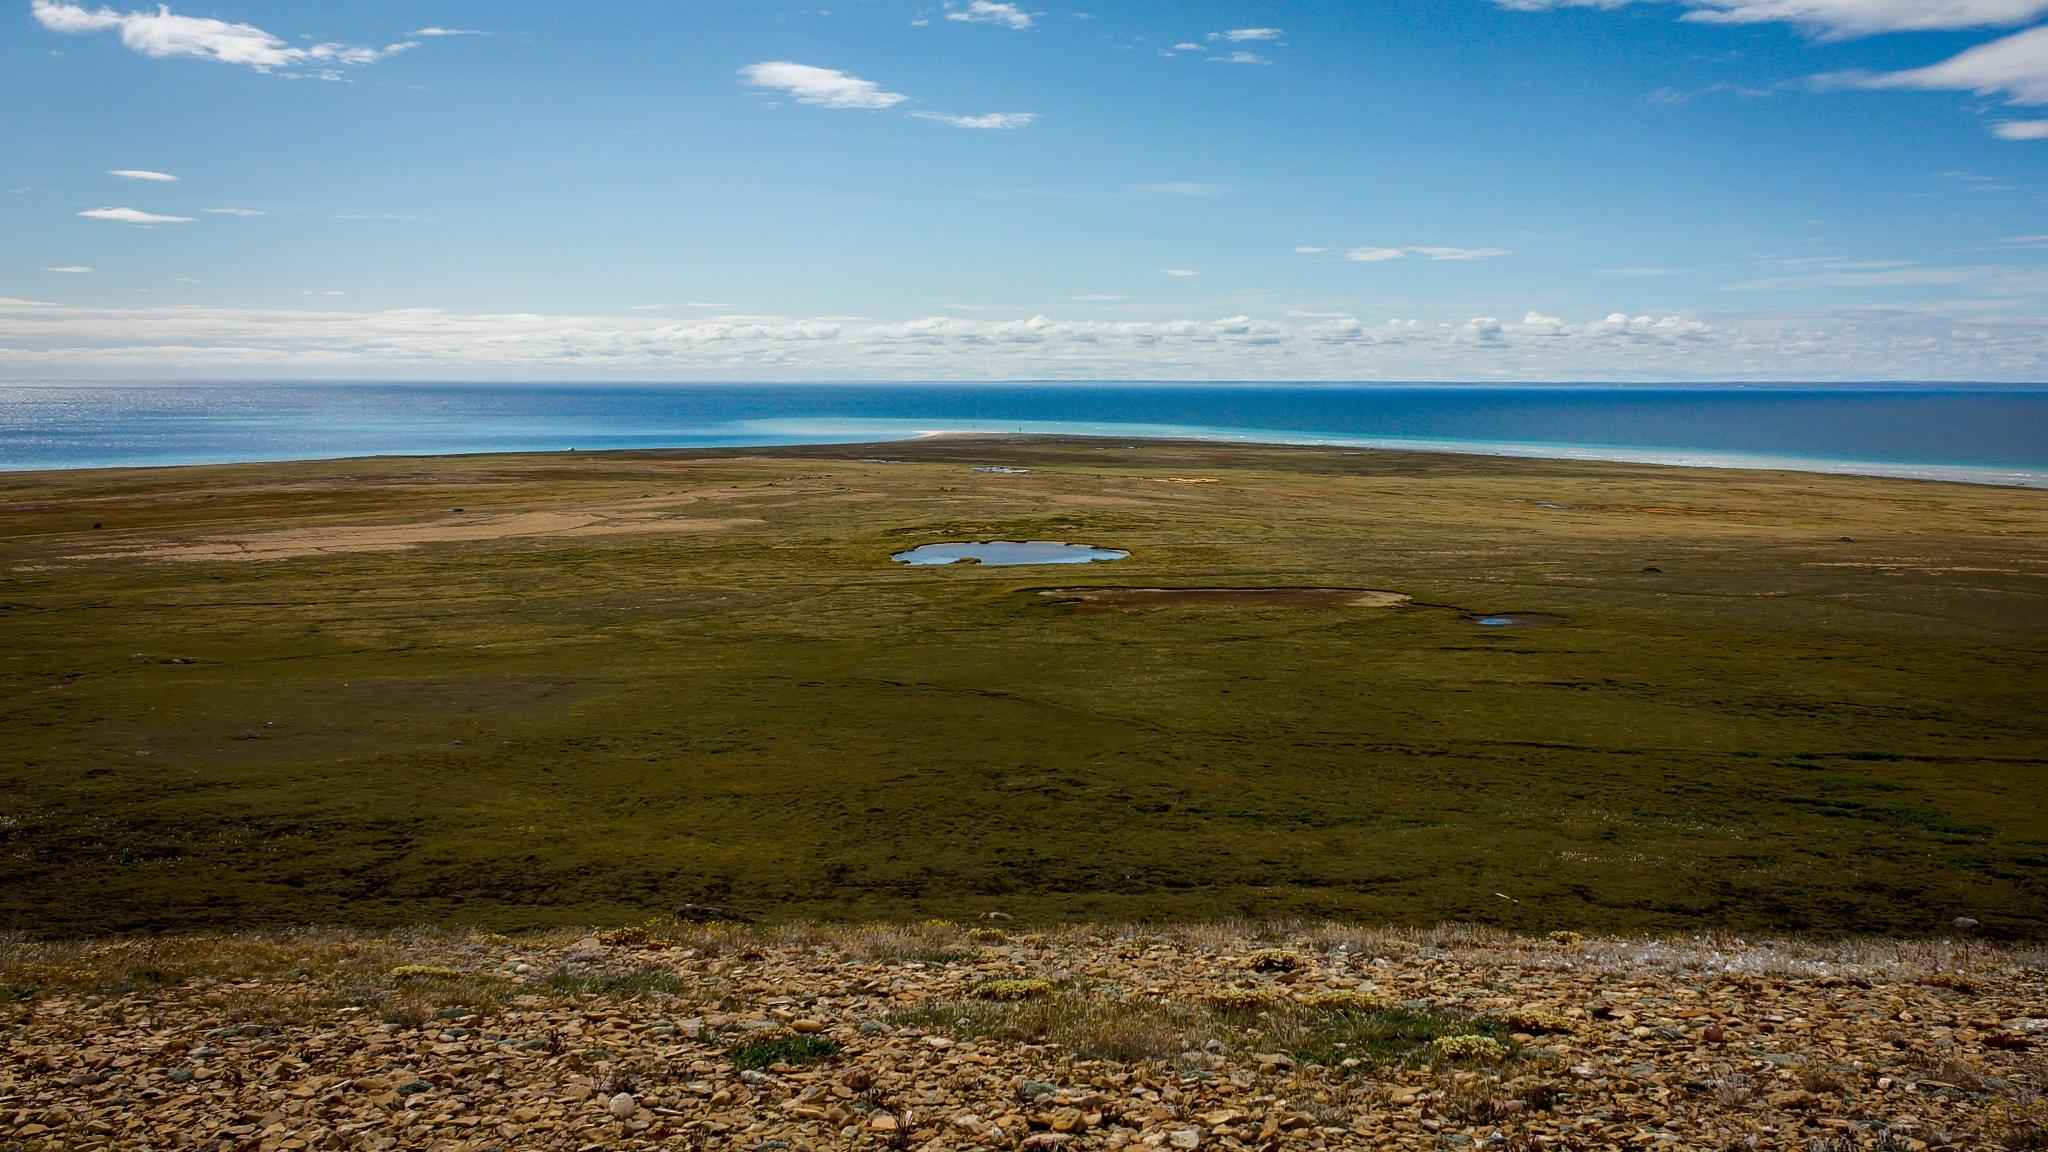 Long Point near Cambridge Bay, Nunavut by Vinko Culjak Mathieu